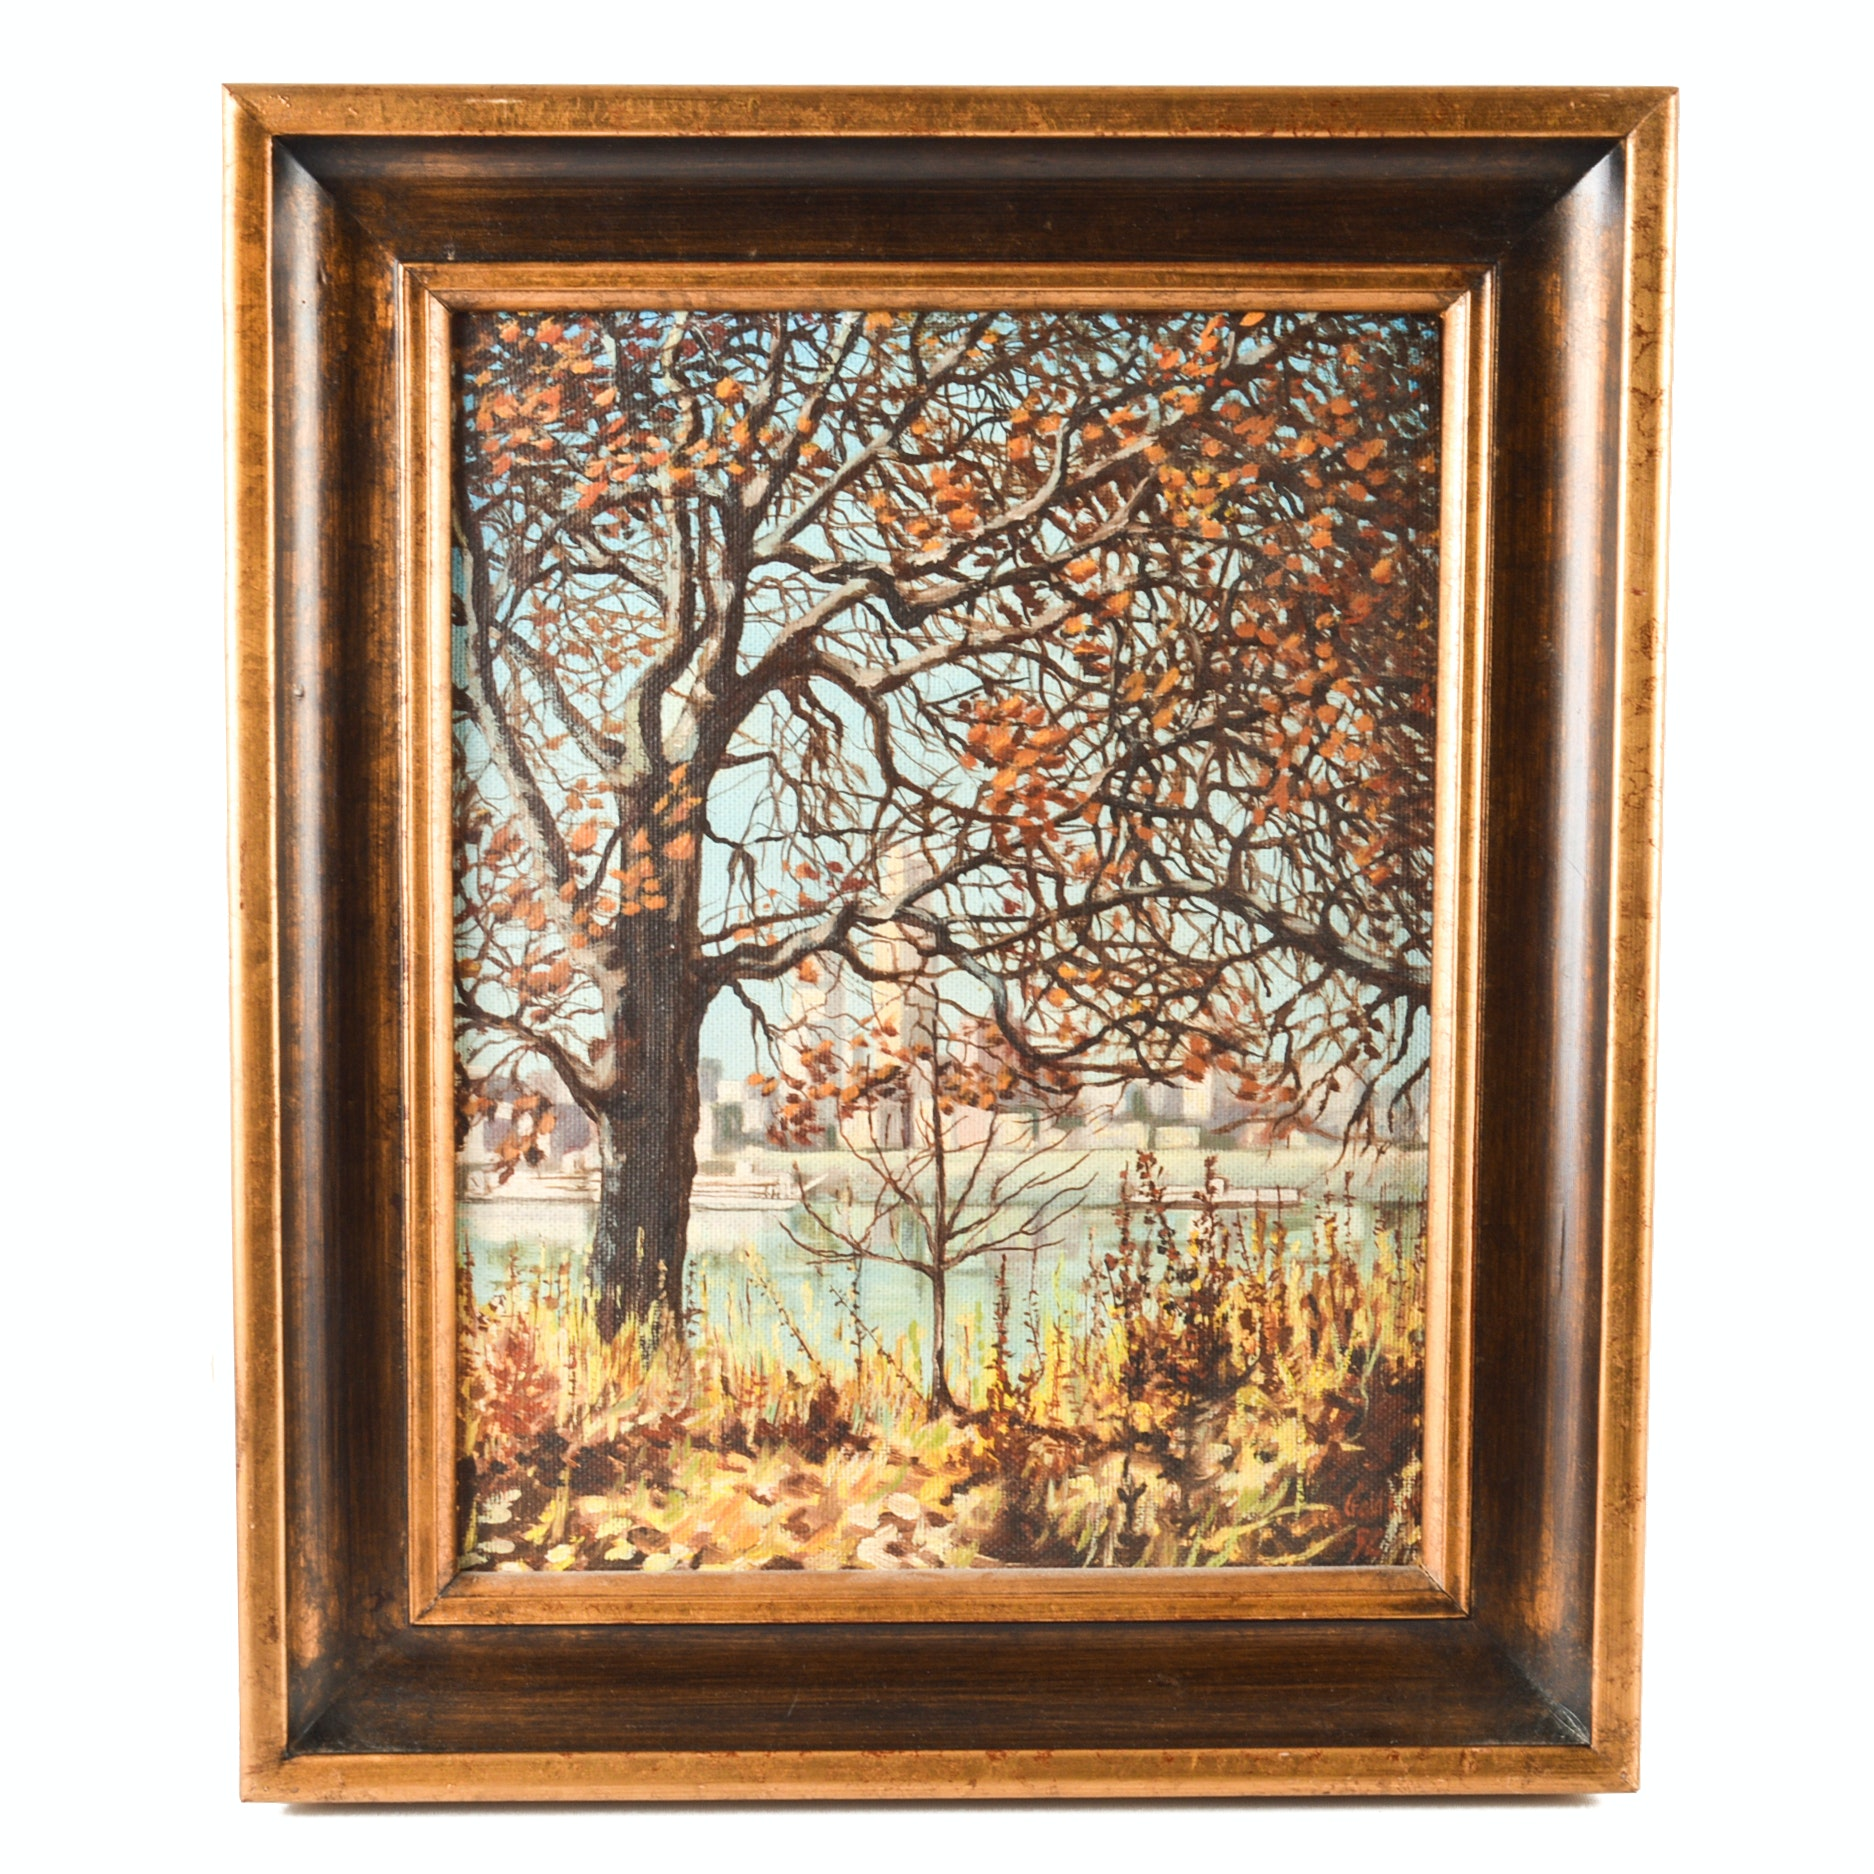 Original Oil on Canvas Board Landscape Painting